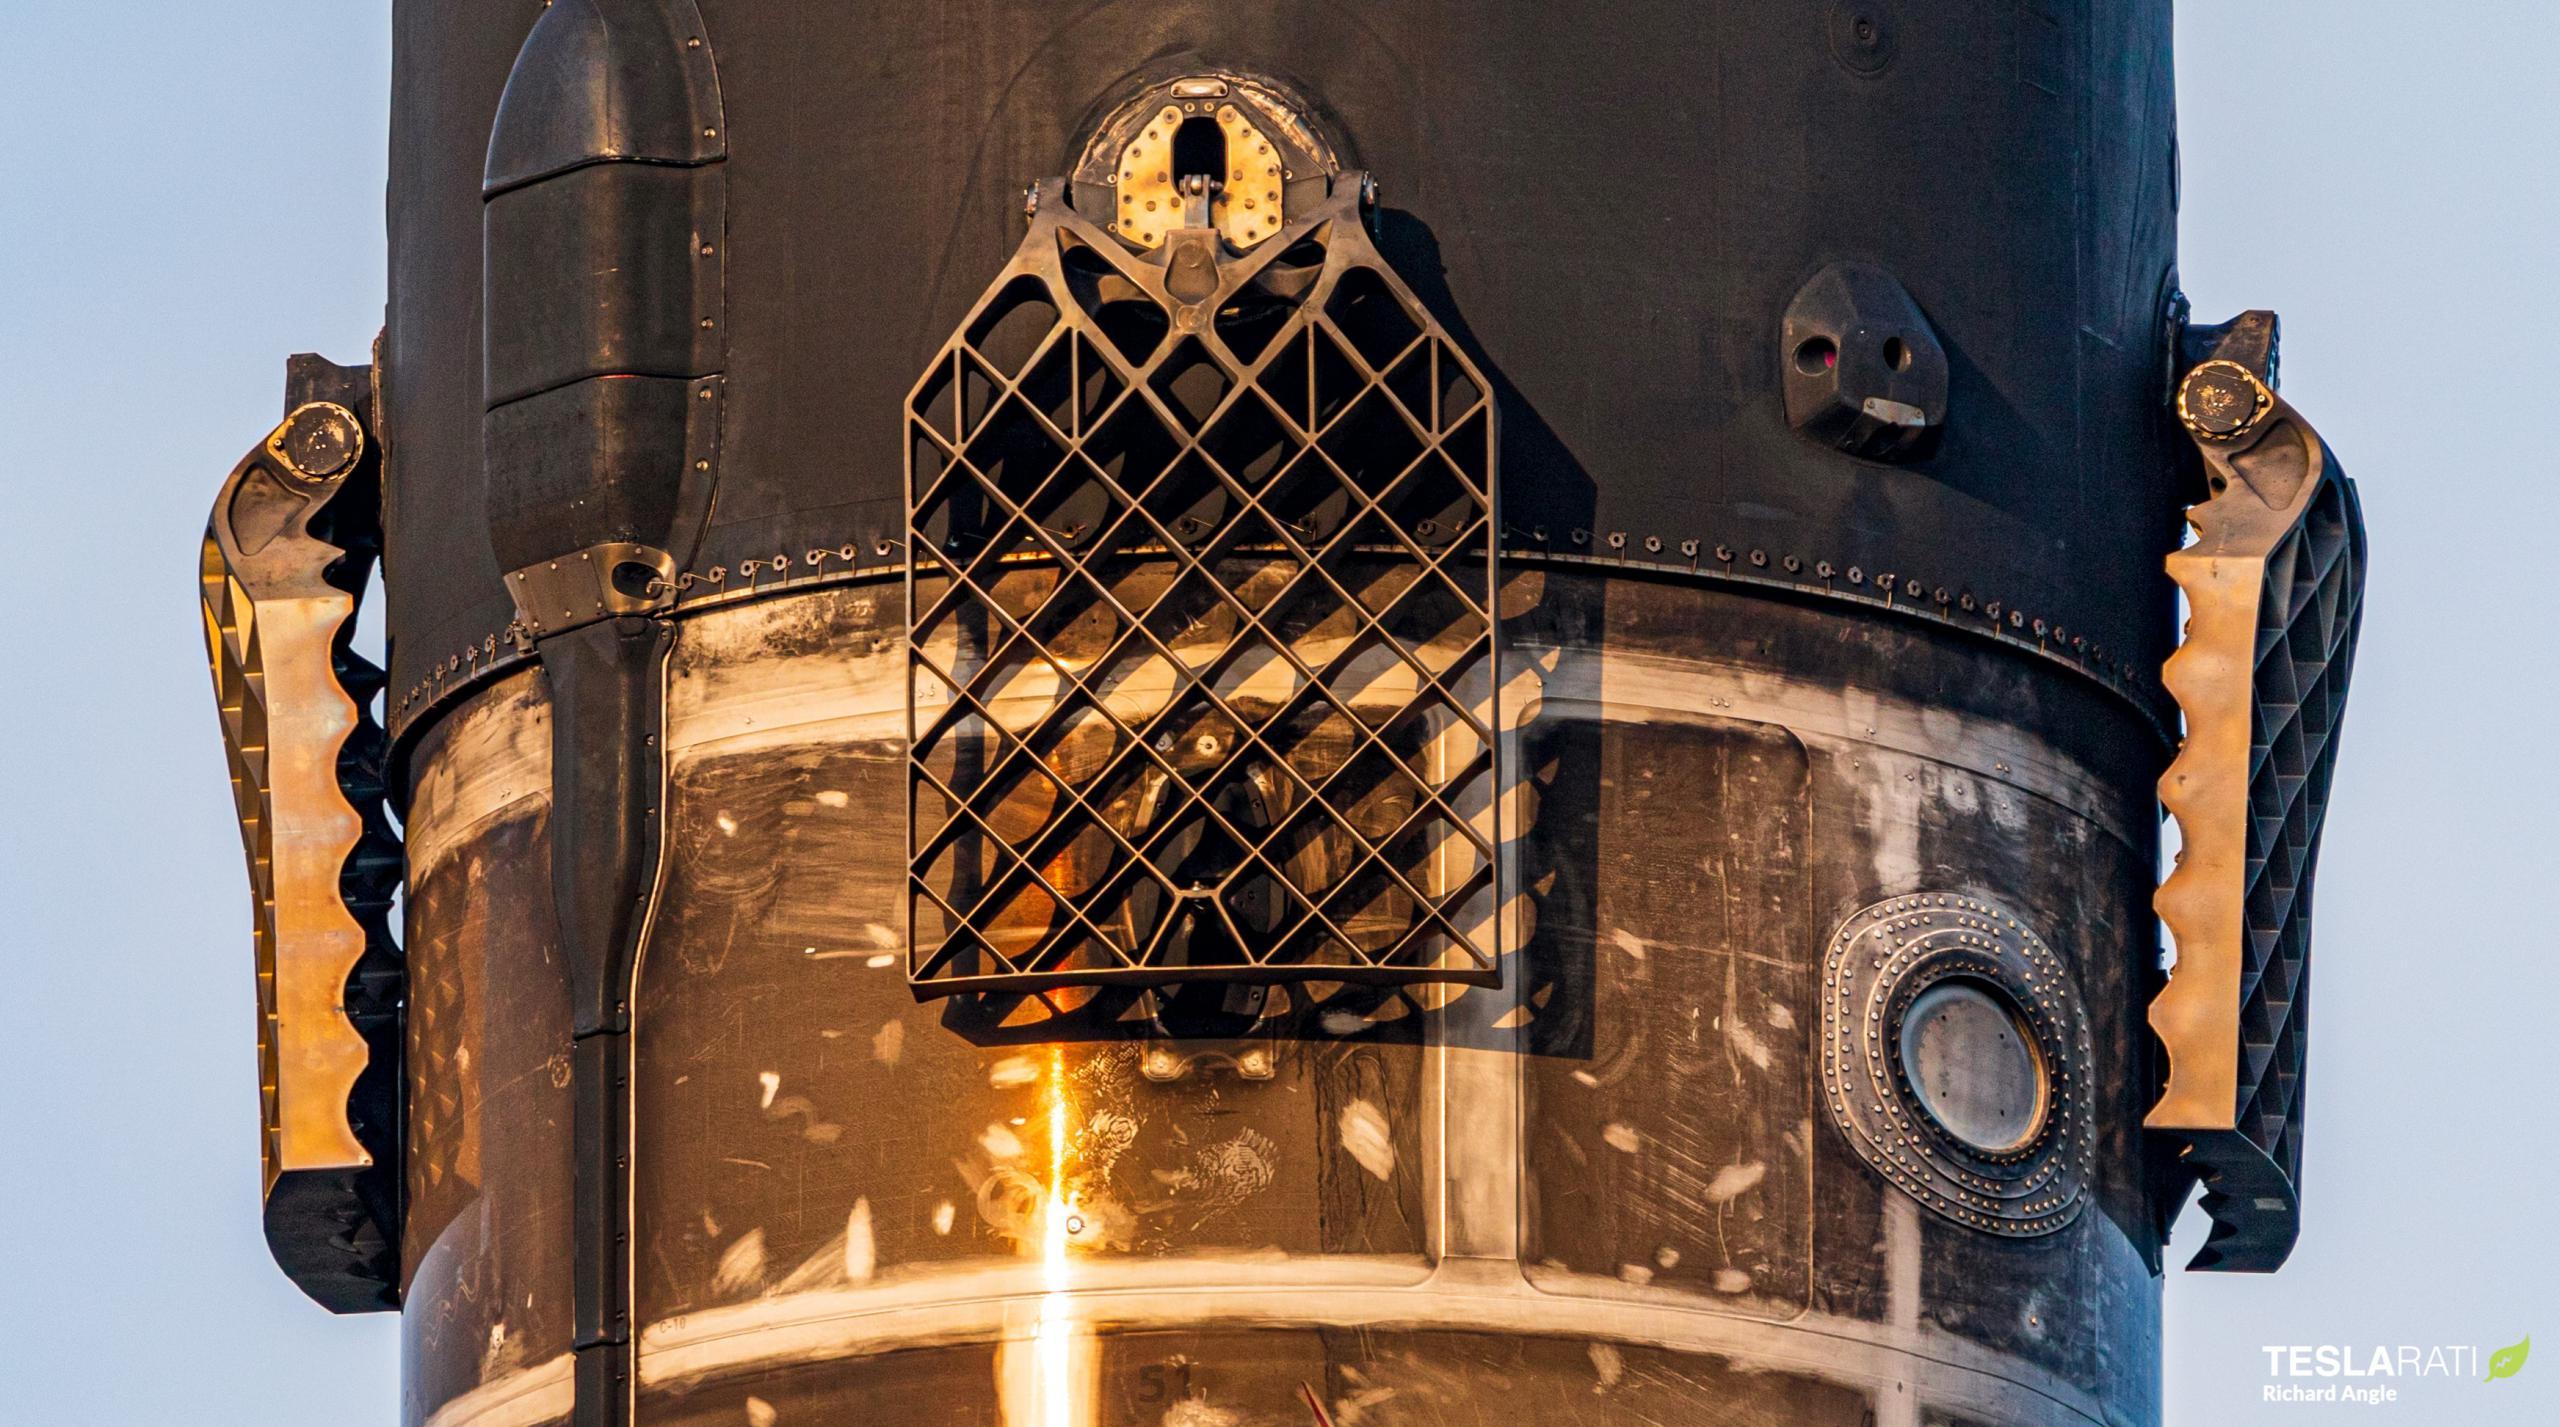 Starlink-21 Falcon 9 B1051 031621 (Richard Angle) port return 2 (c)